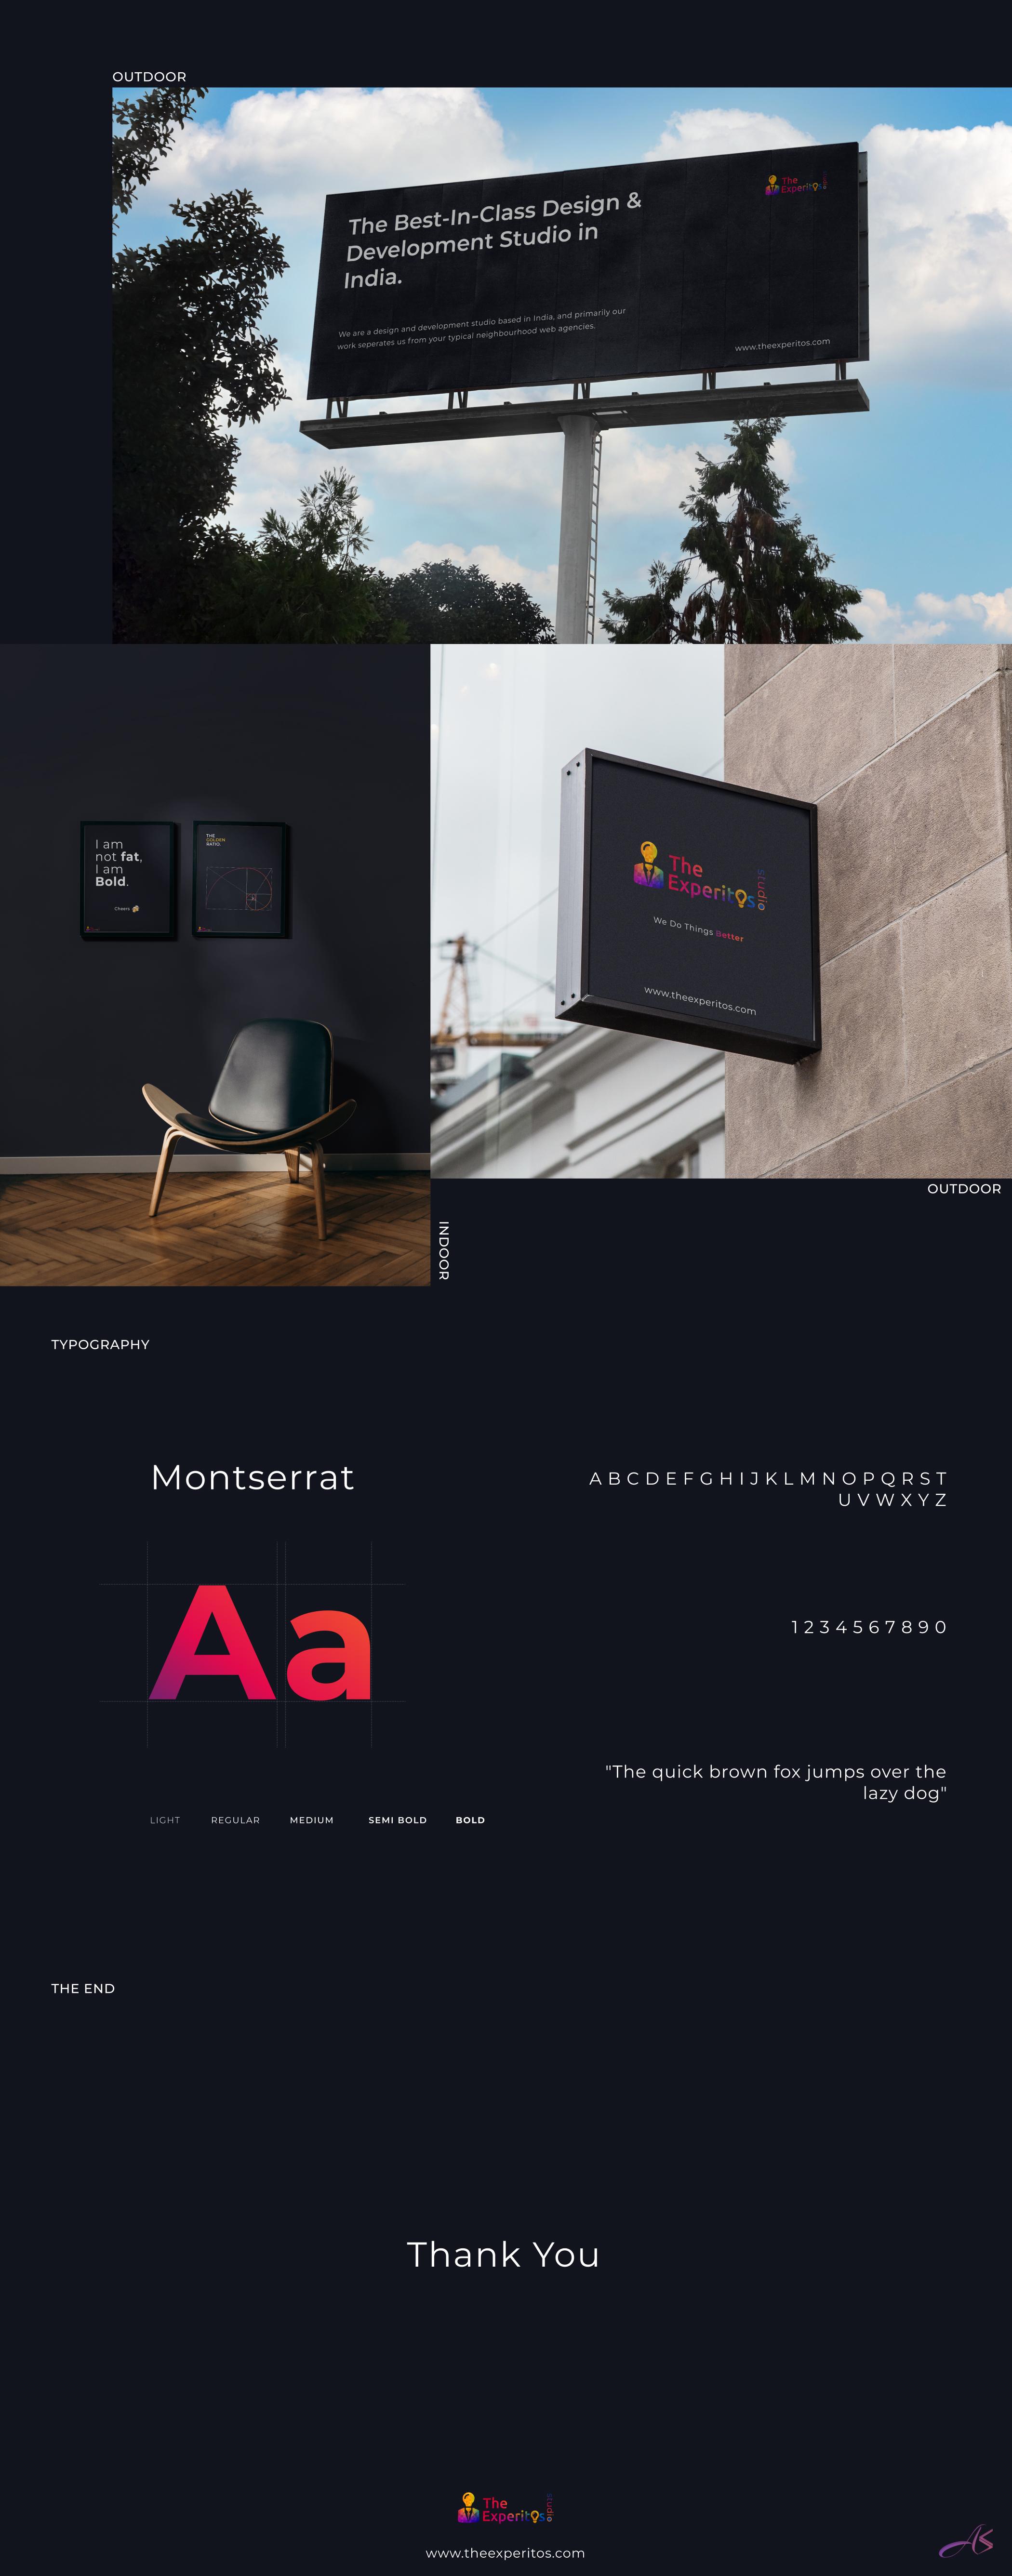 The experitos studio branding